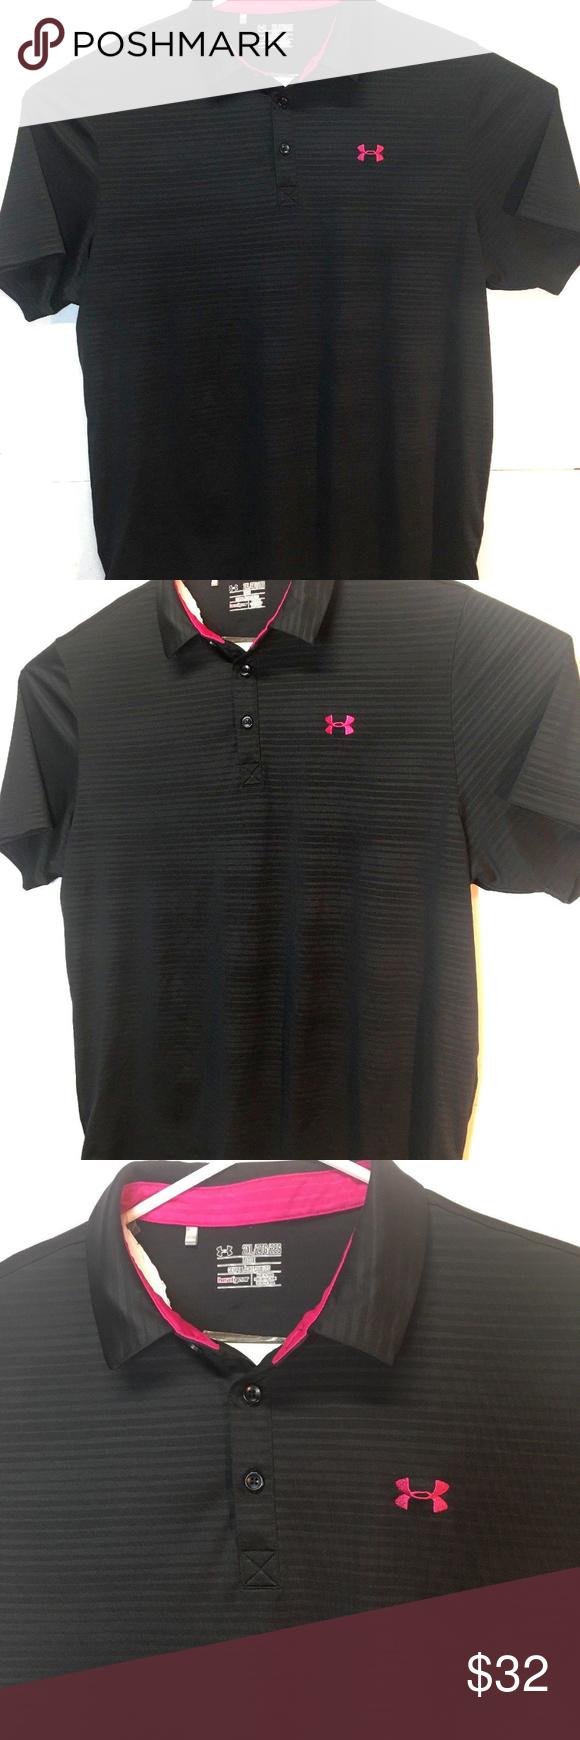 32b2ad14 Under Armour Golf Shirts Pink | Kuenzi Turf & Nursery